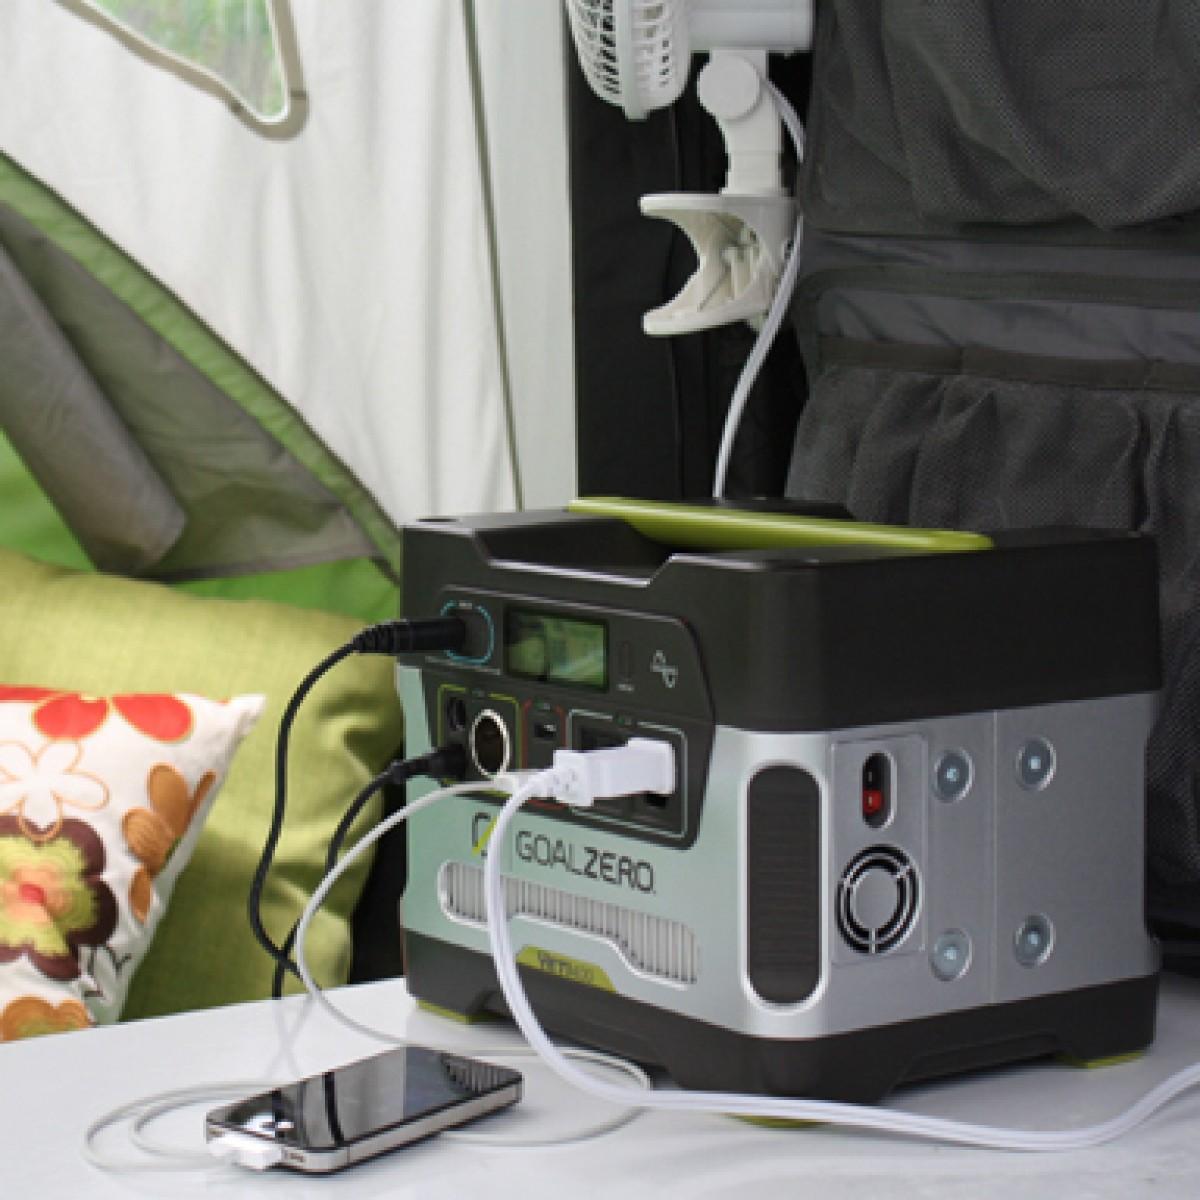 Syvlansport Go Pop Up Camper Goes Solar With Goal Zero